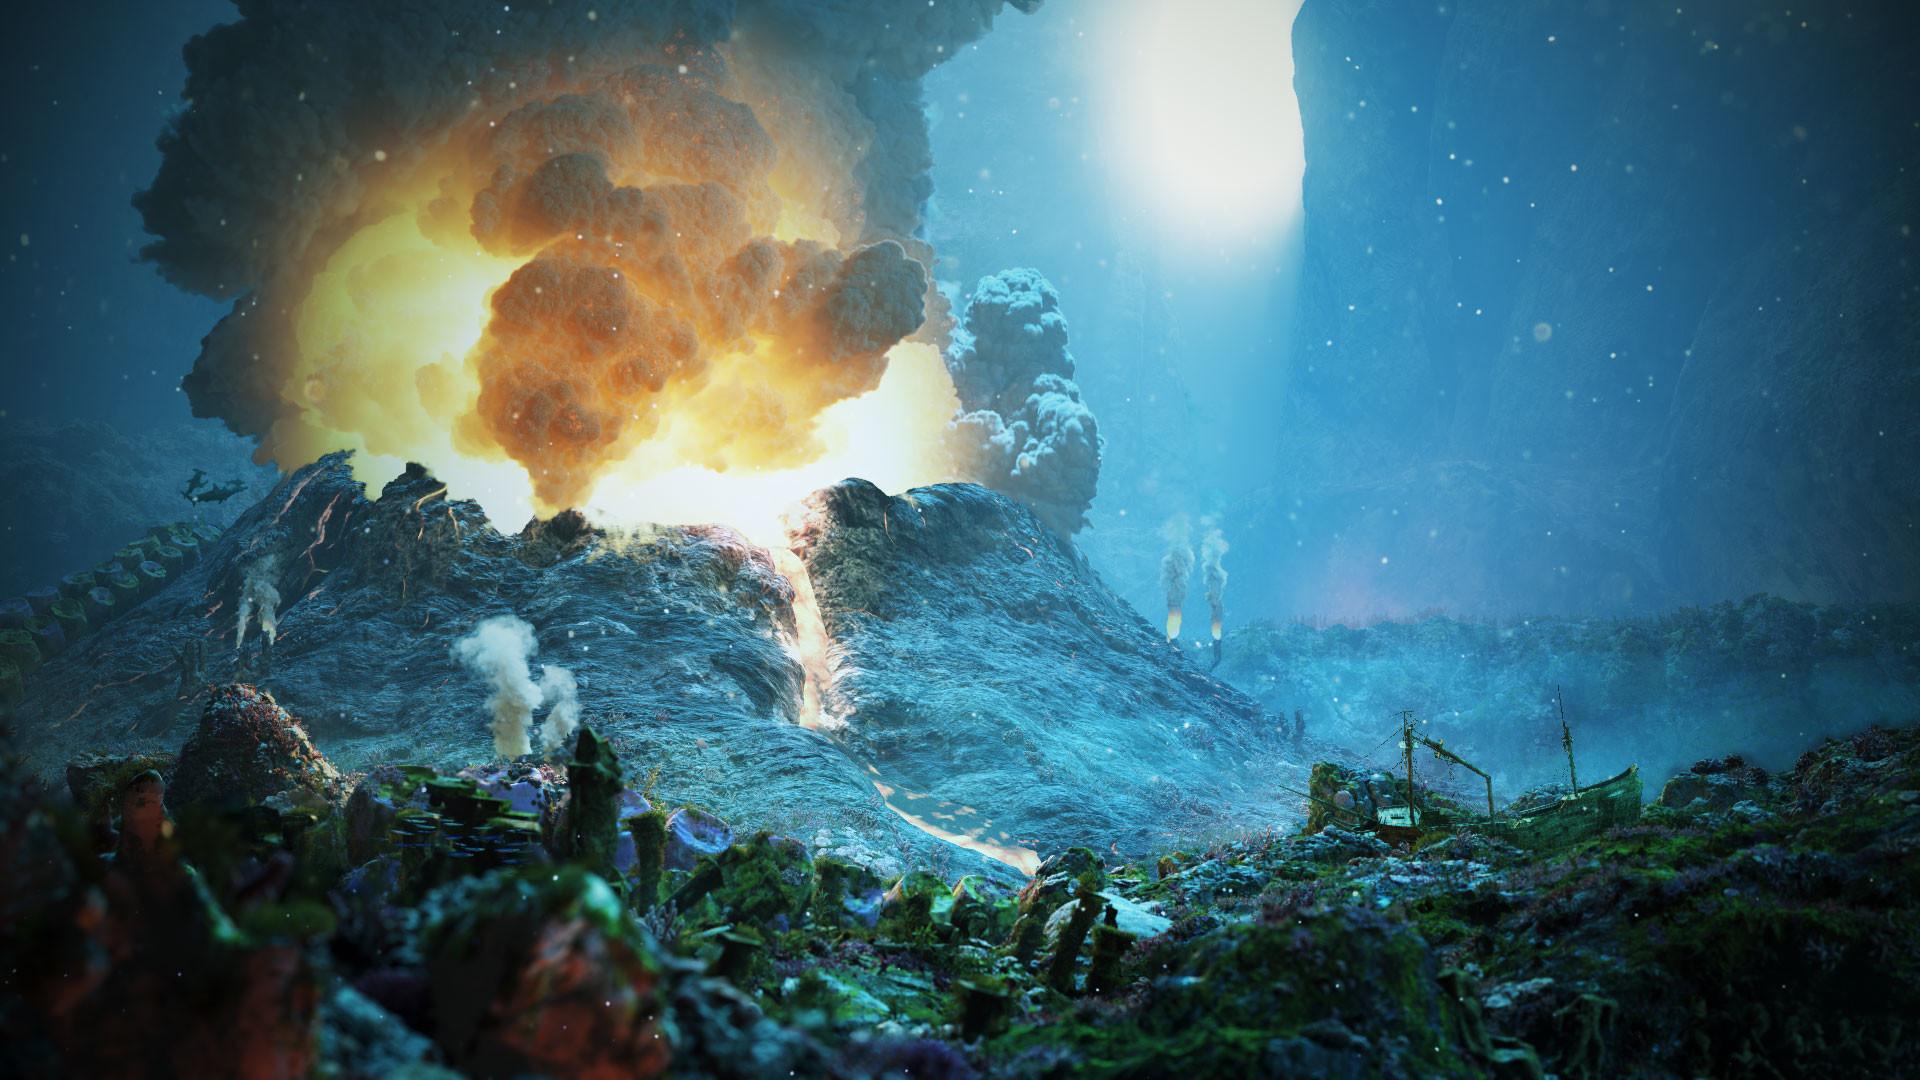 ArtStation Underwater Volcano Samuel Enslin